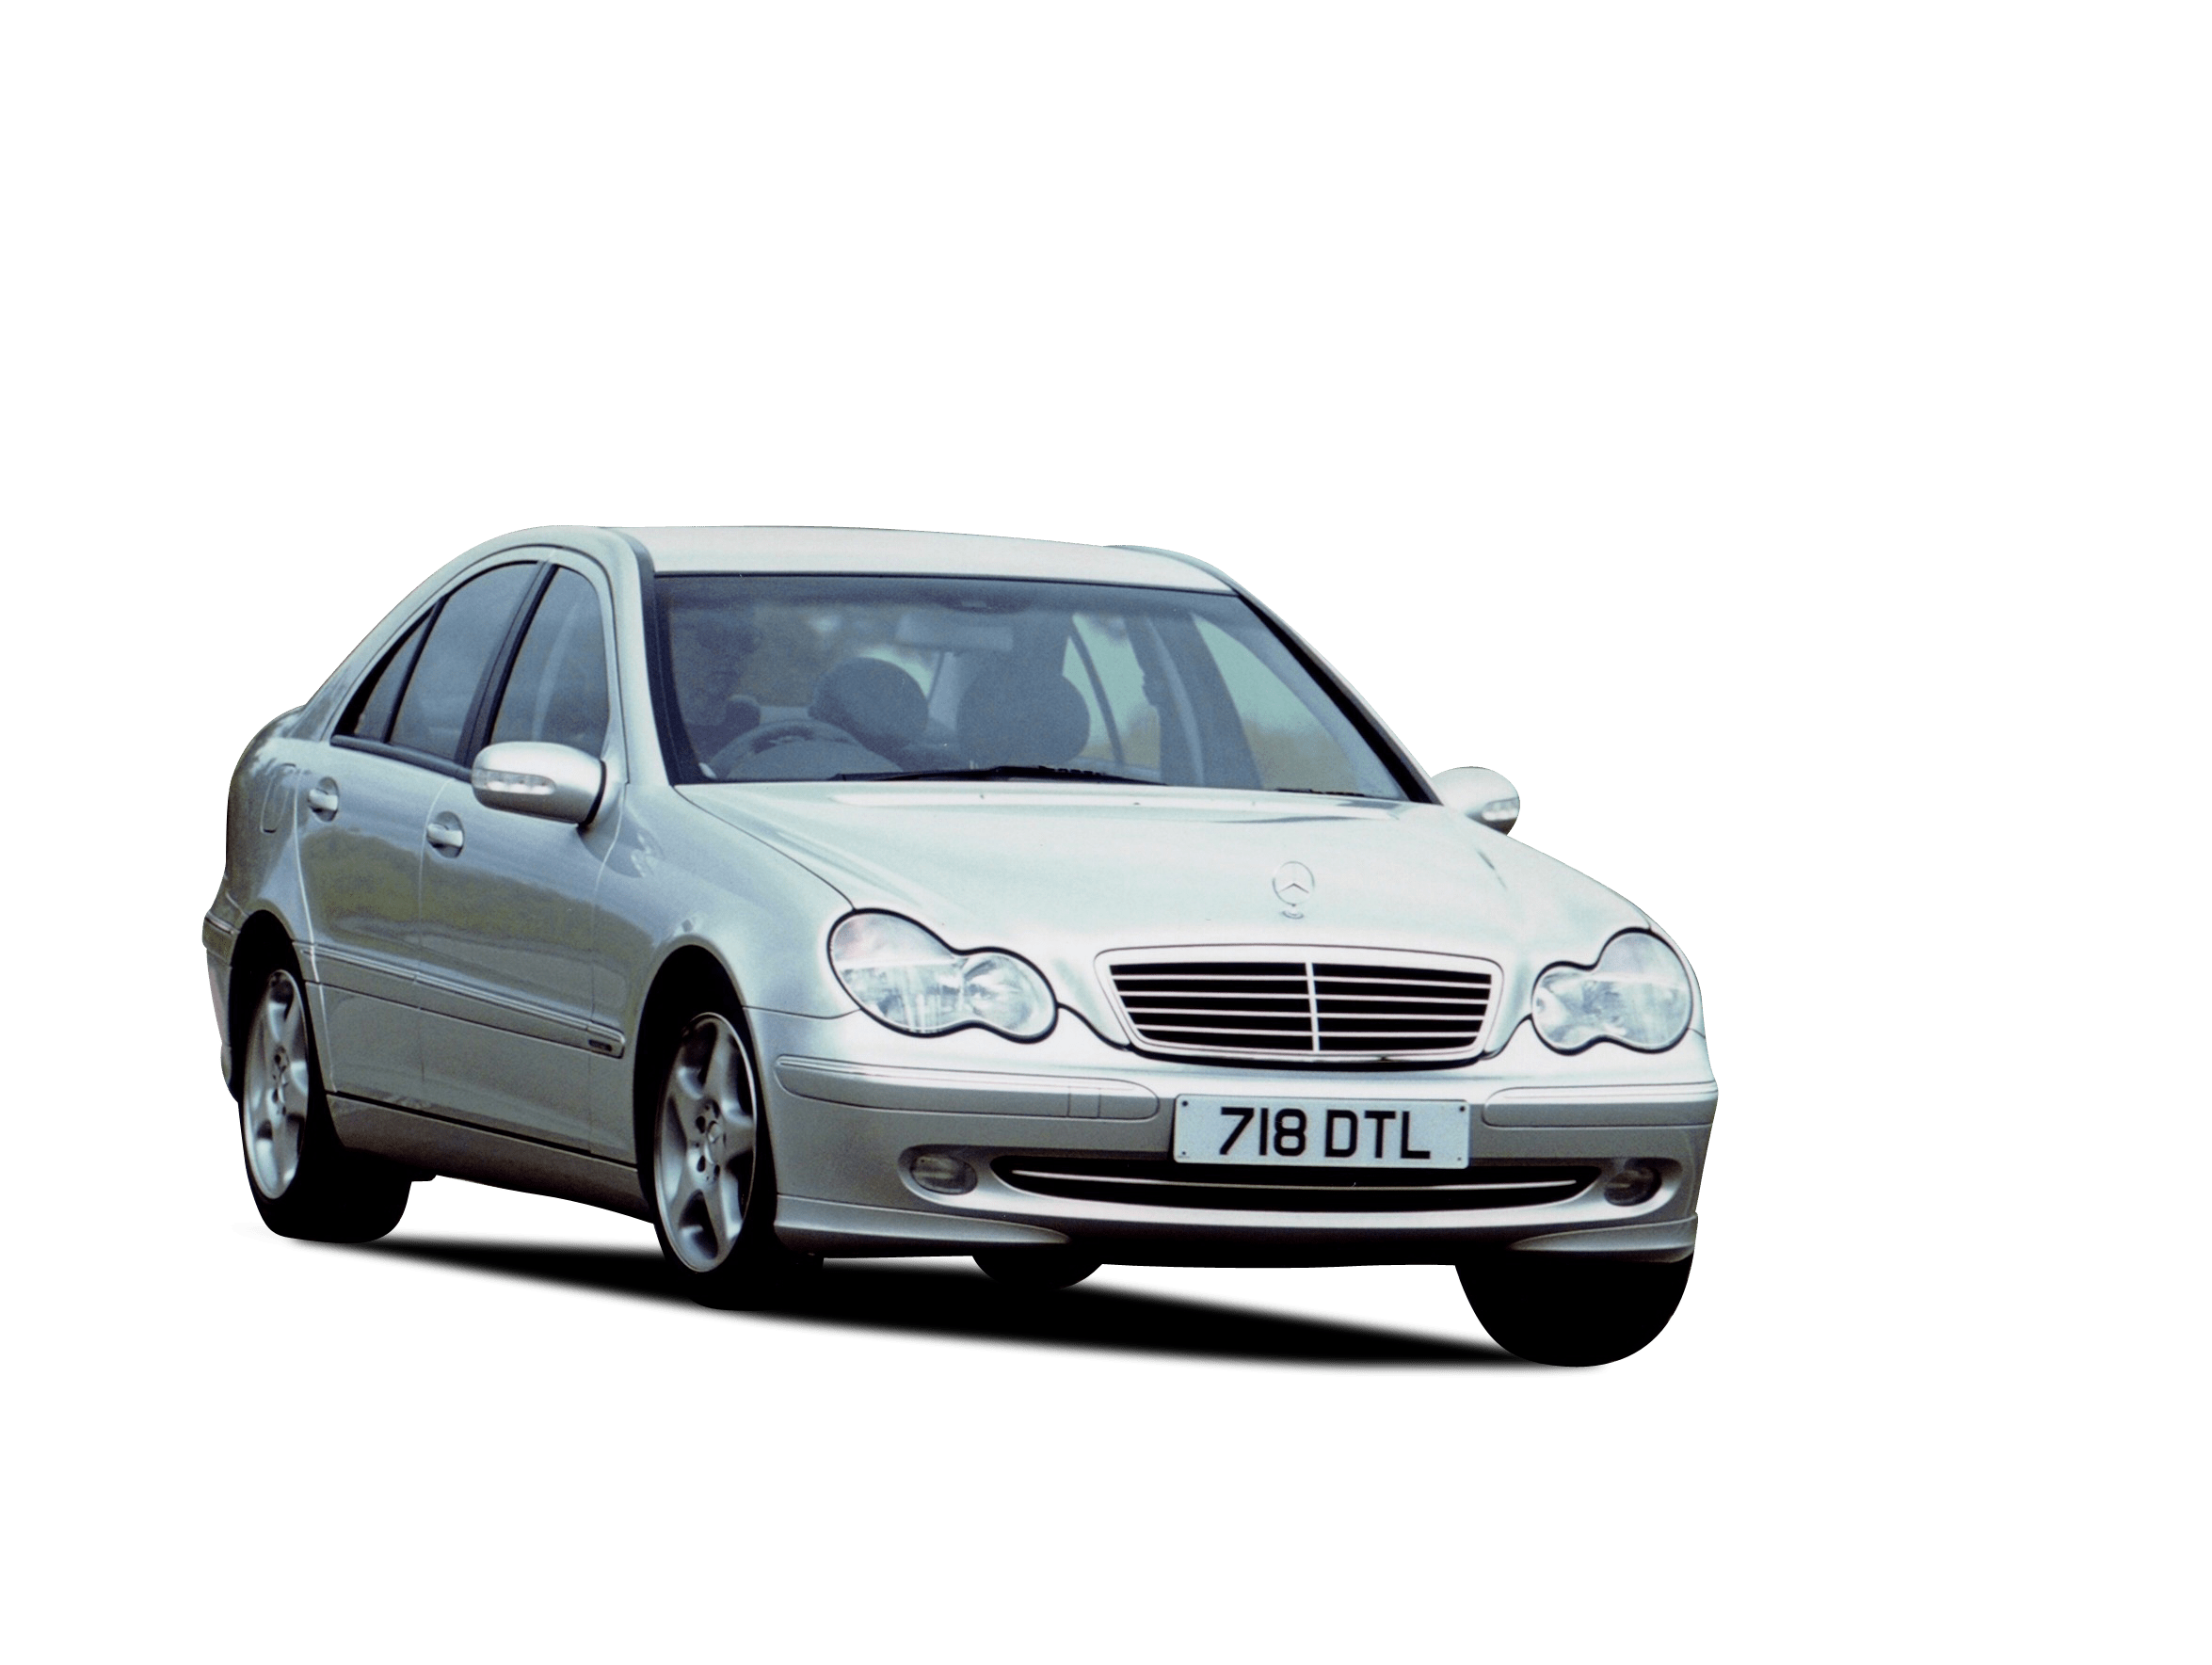 Mercedes C 180 - reliability and prestige